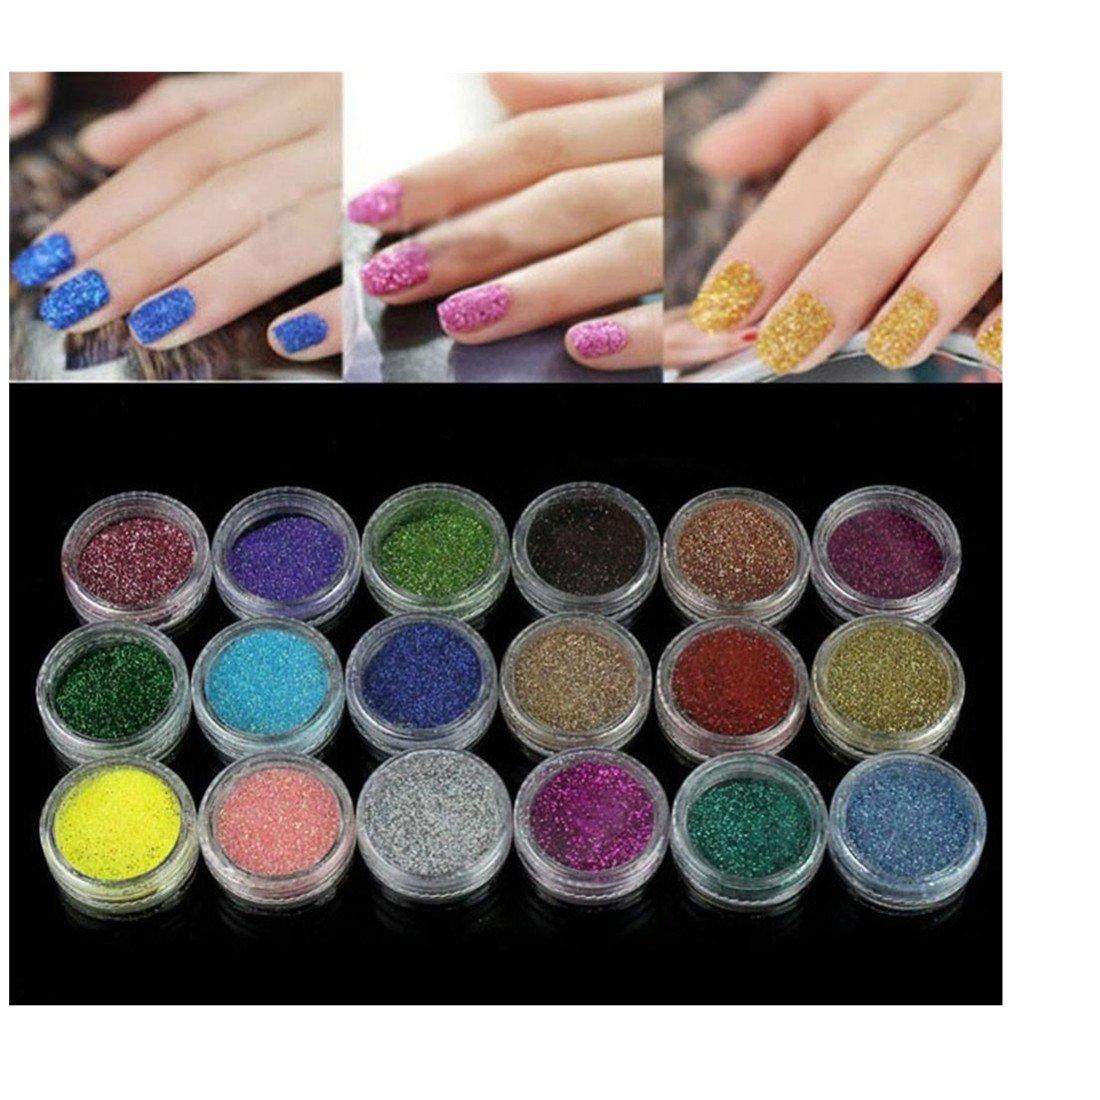 Nail Art Tools Kit Set, 18 Colors Kingfansion Nail Art Glitter Powder For UV GEL Acrylic Powder Decoration Tips